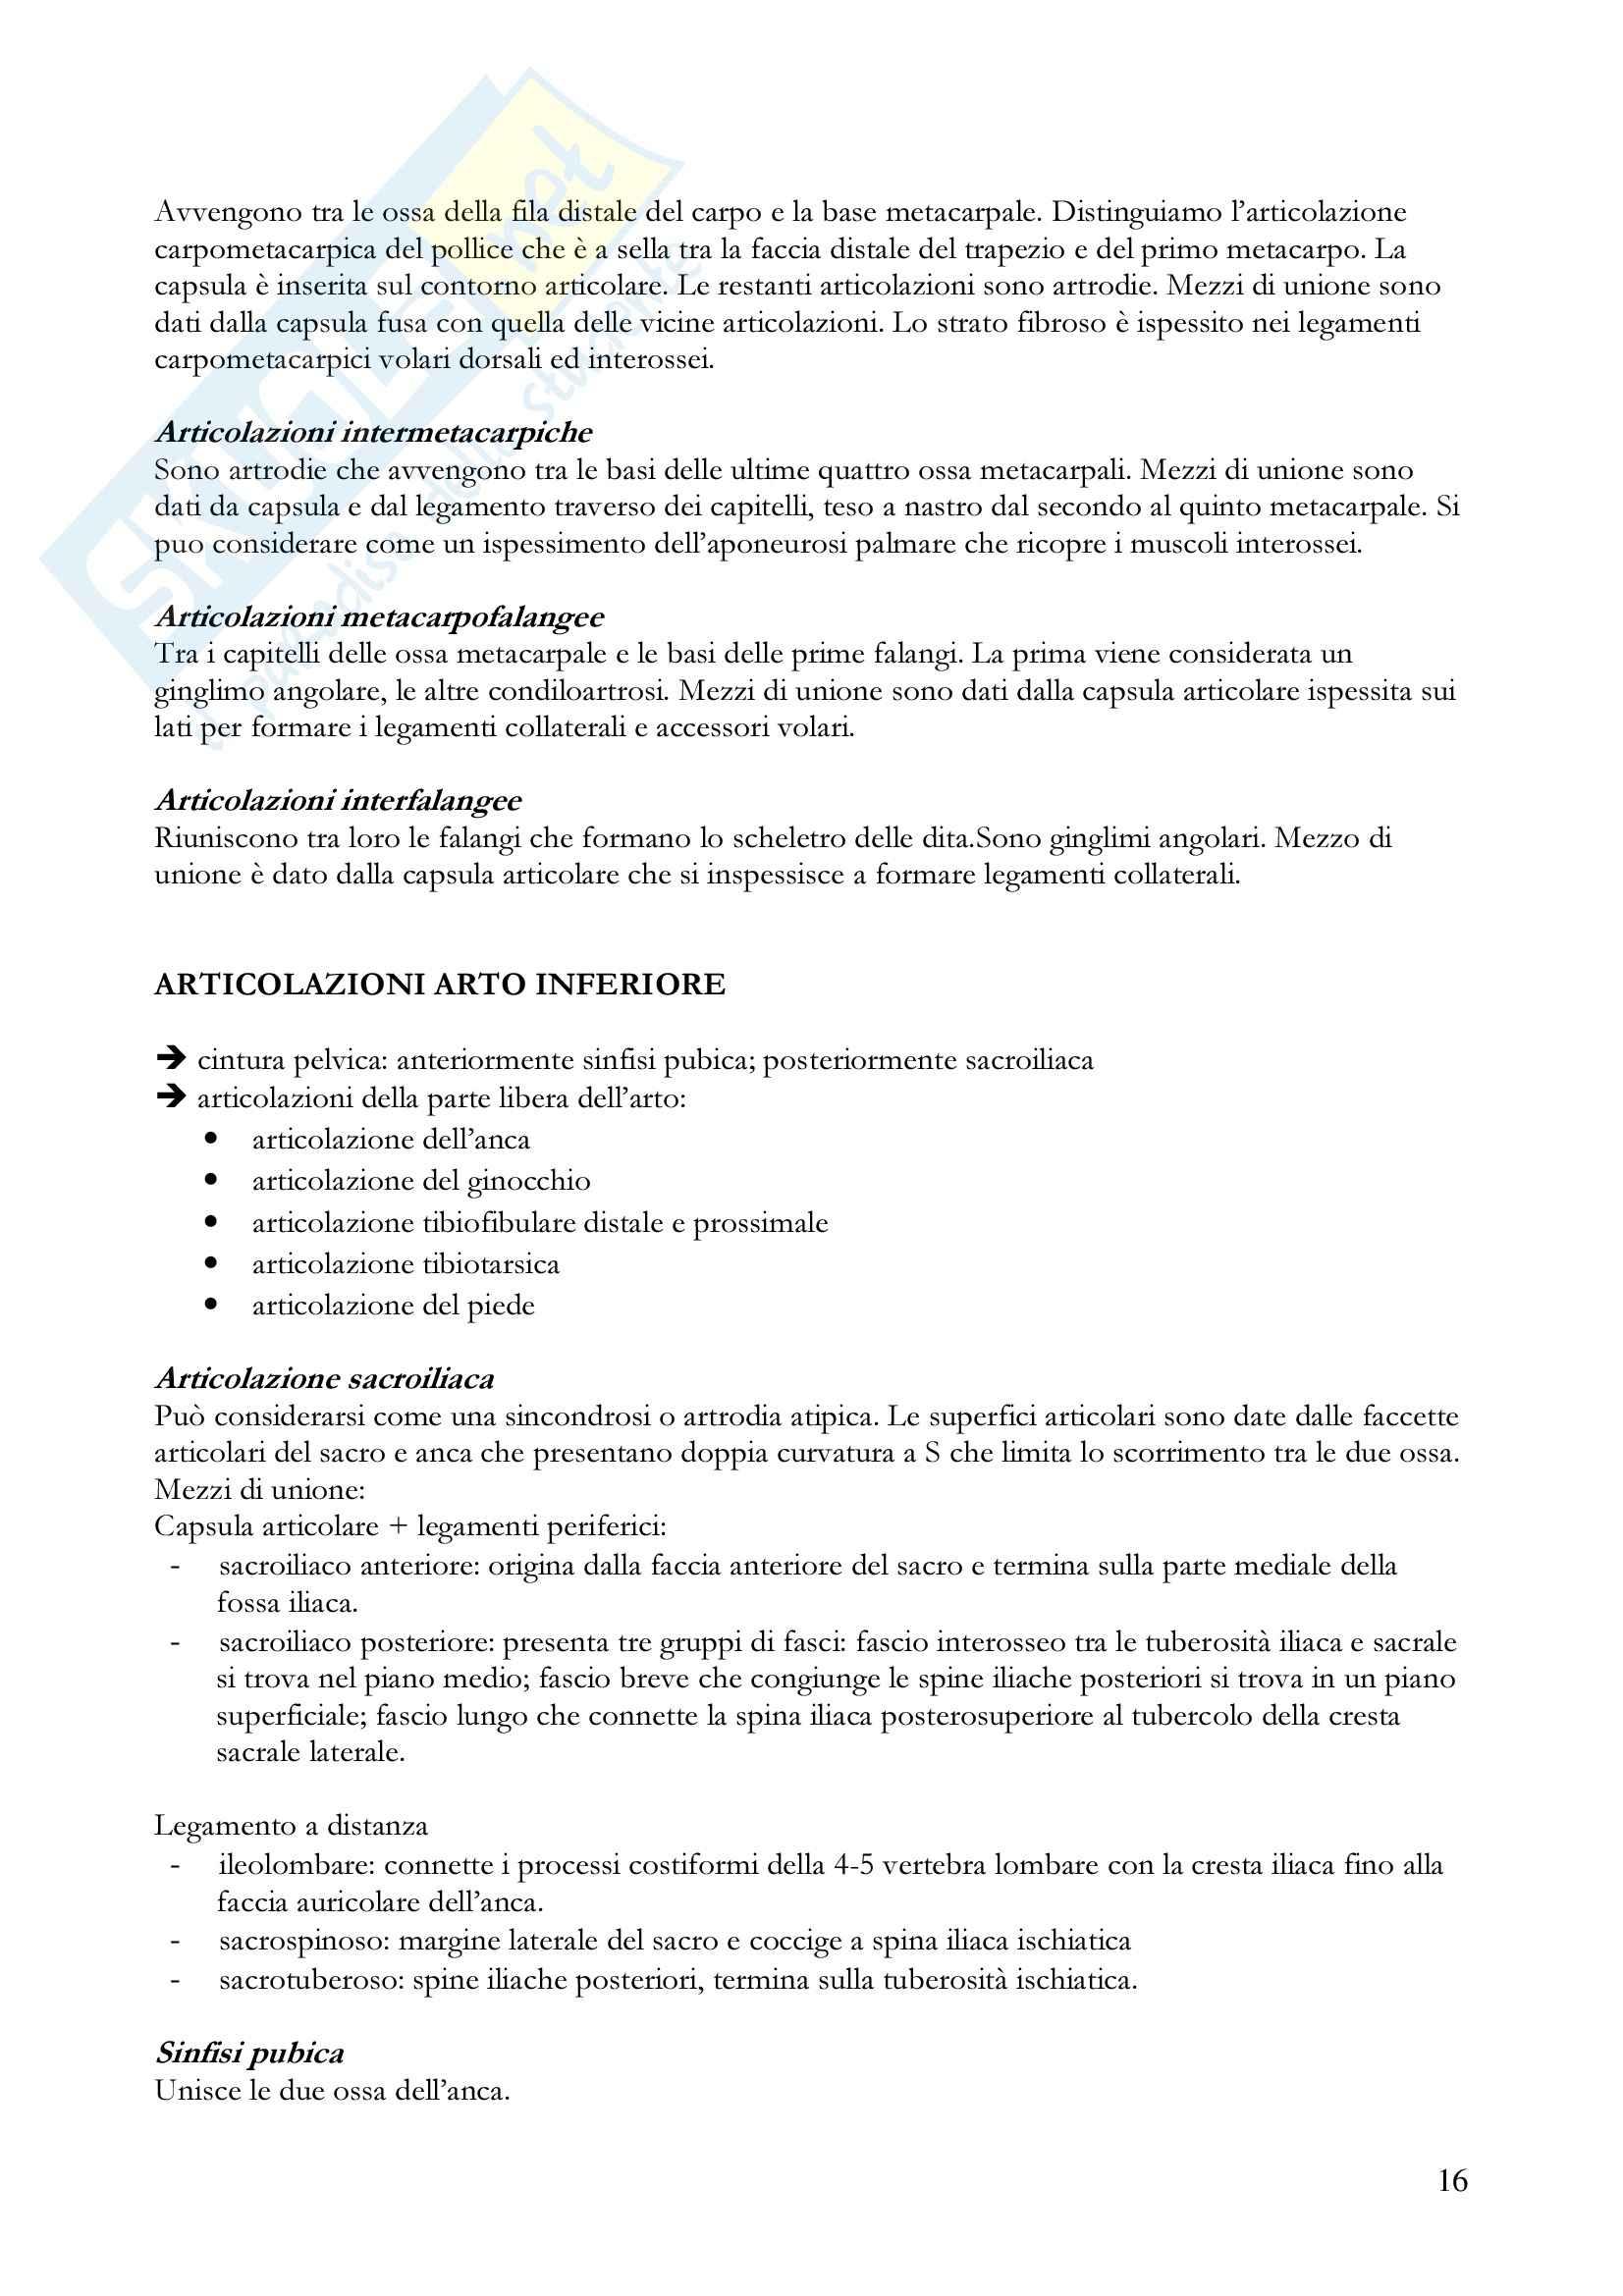 Anatomia umana - apparato locomotore Pag. 16